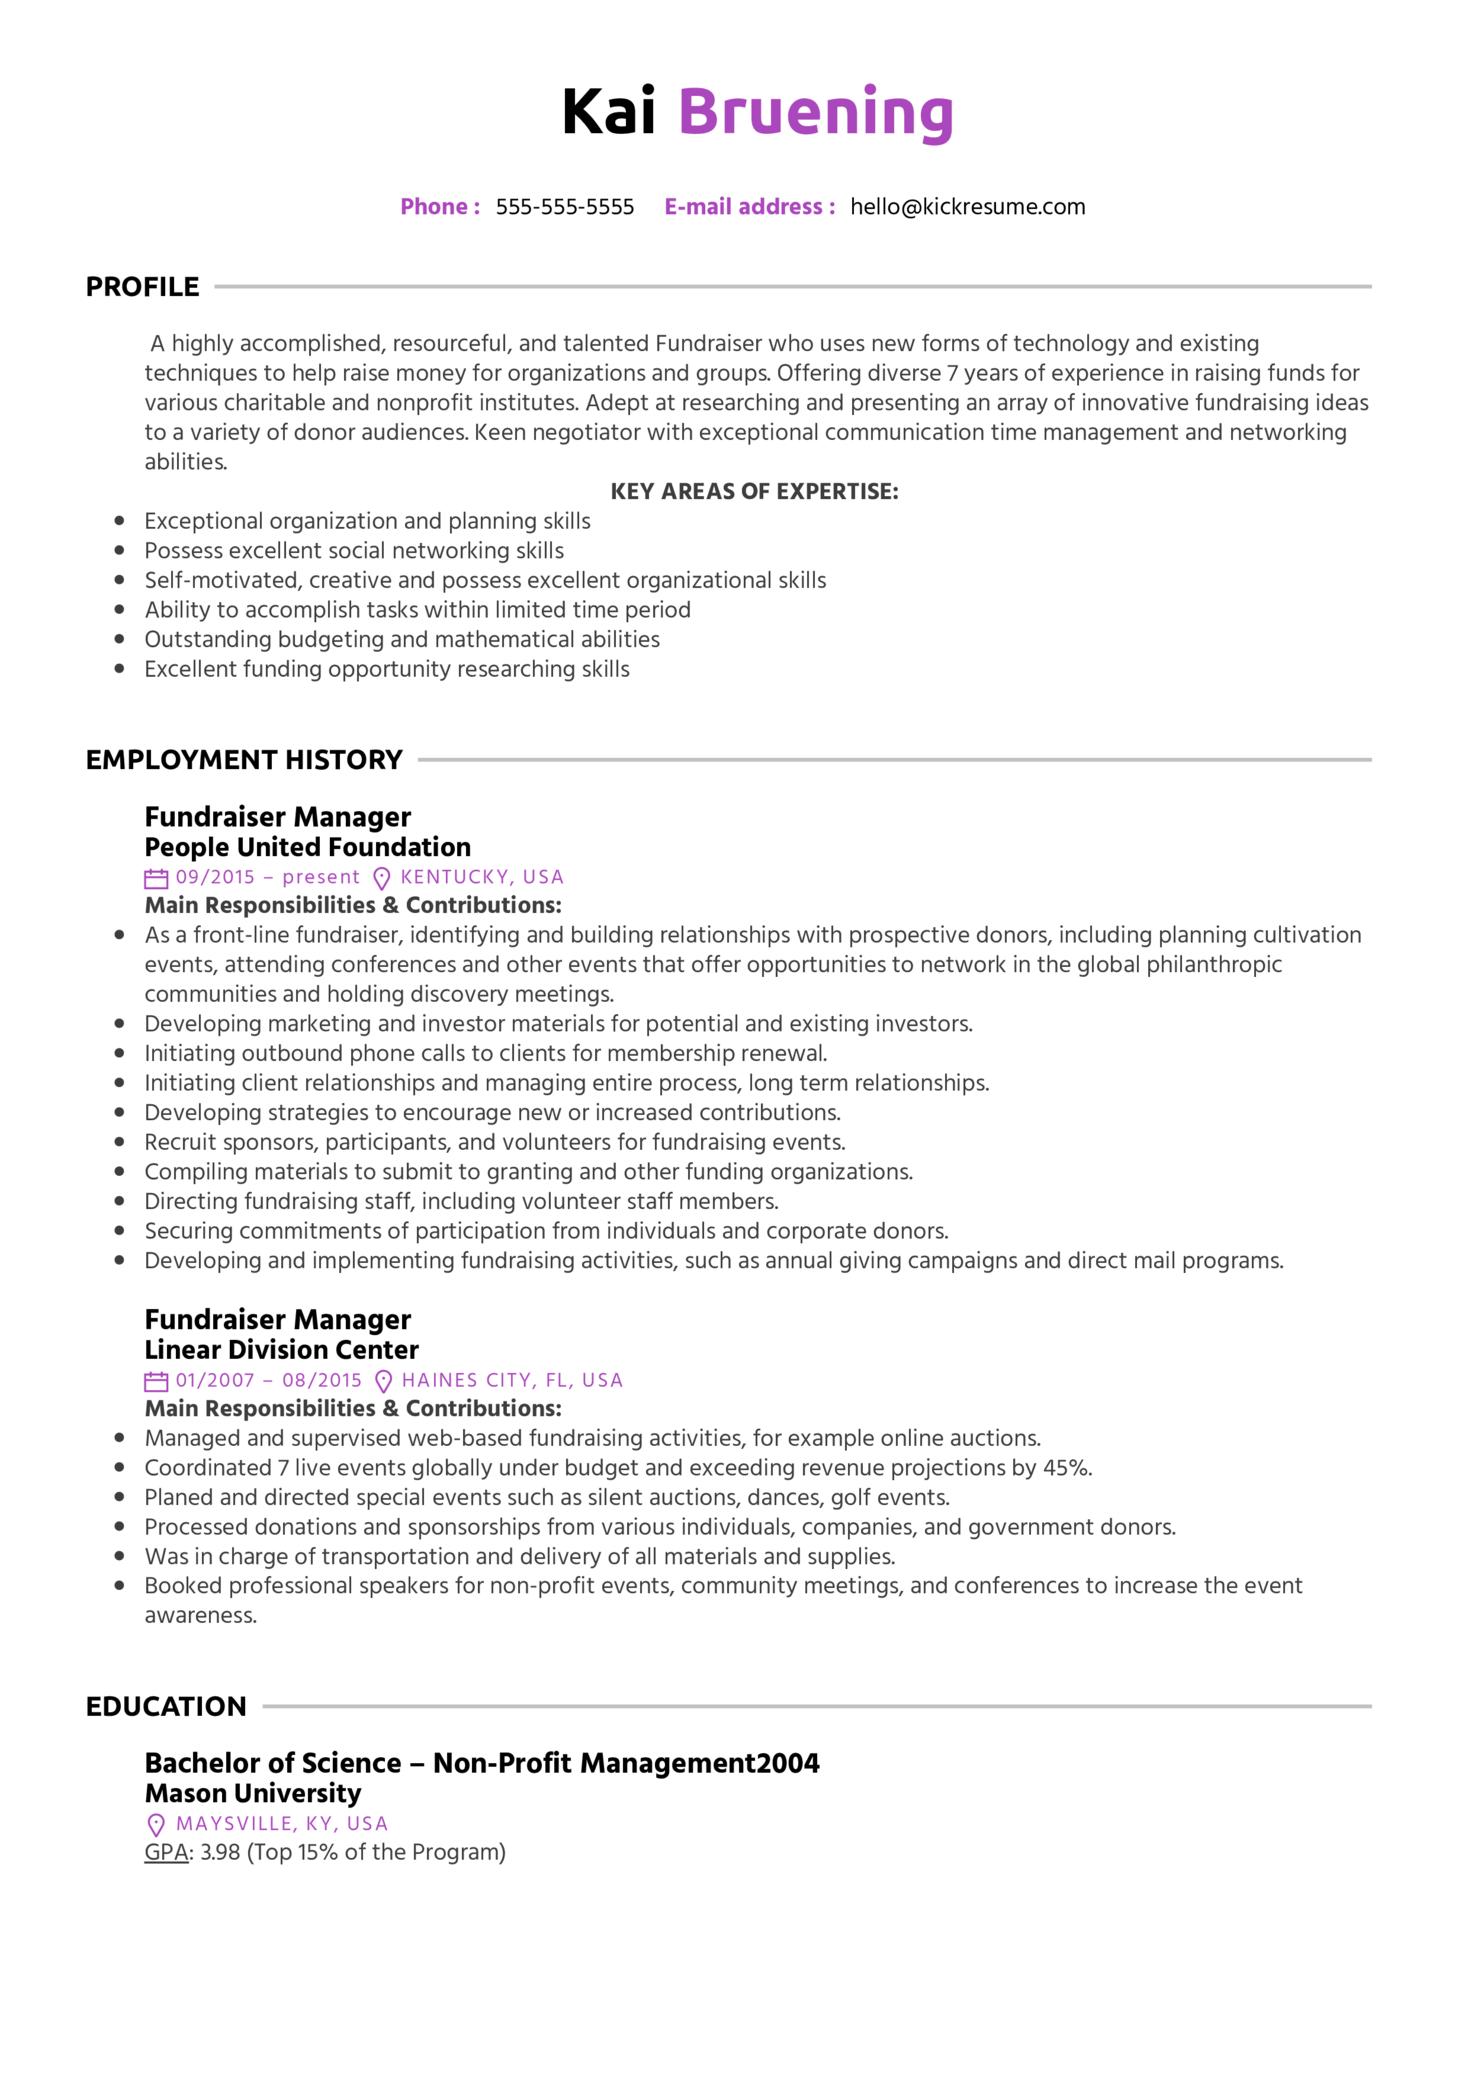 Fundraiser Manager Resume Sample (Part 1)